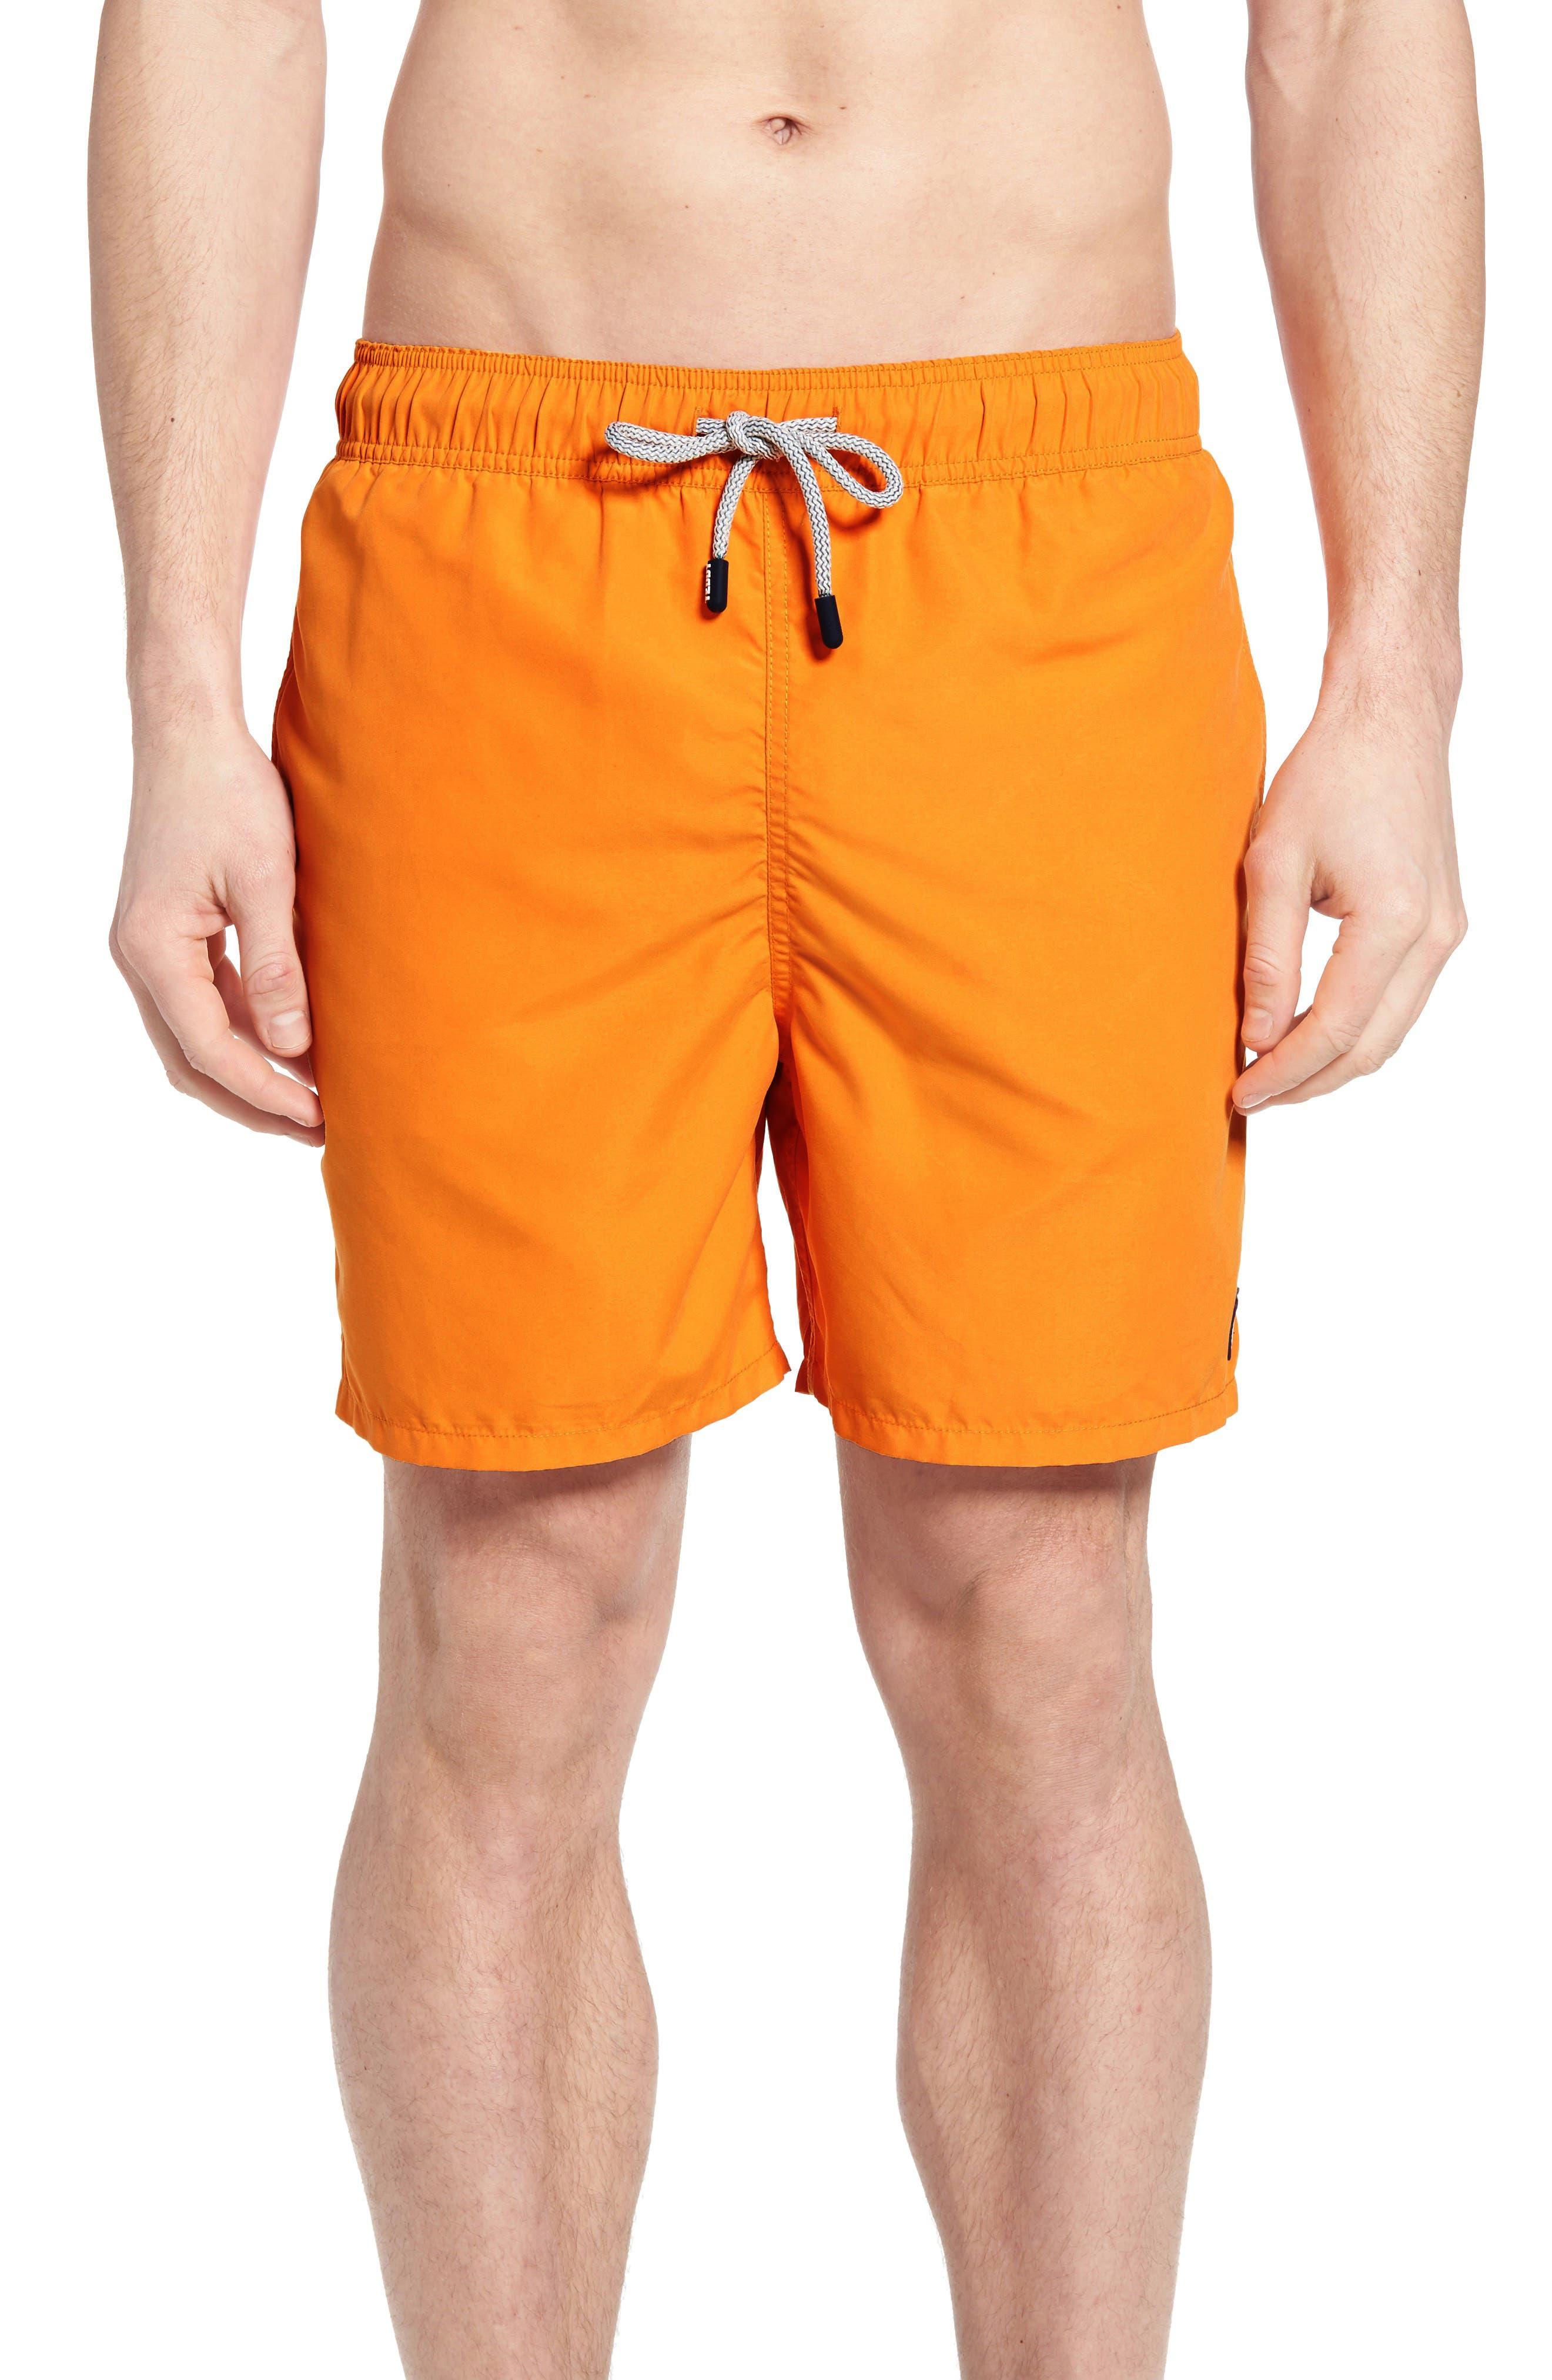 TOM & TEDDY Swim Trunks in Baked Orange